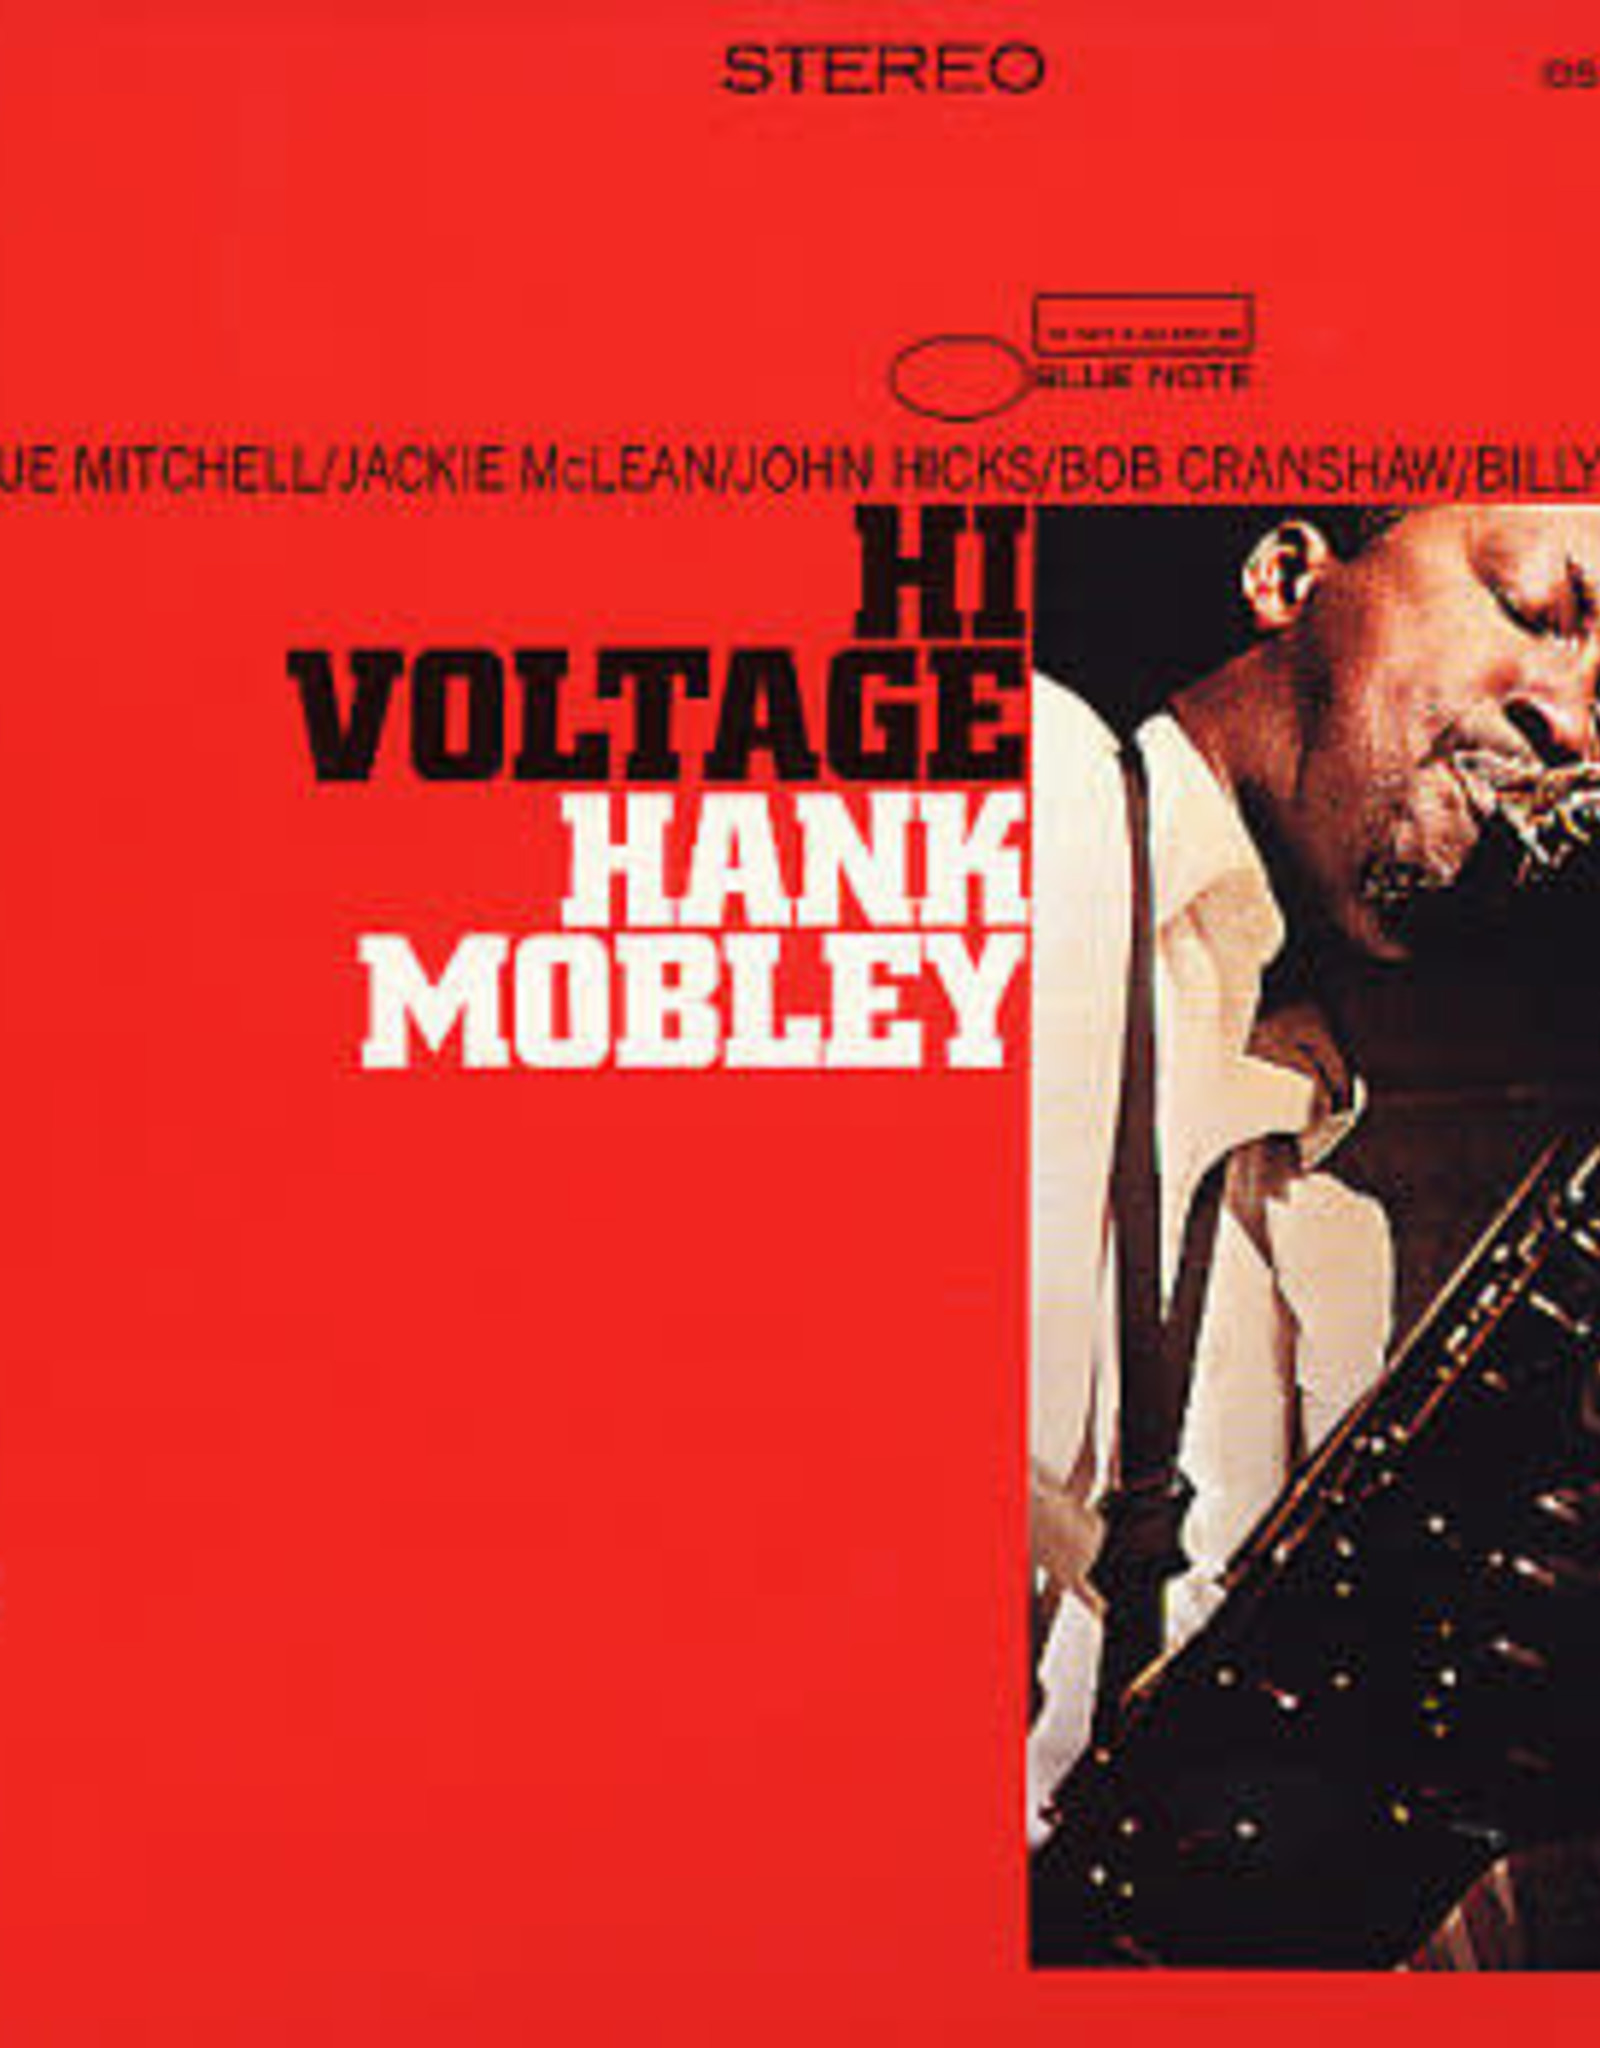 Hank Mobley - High Voltage